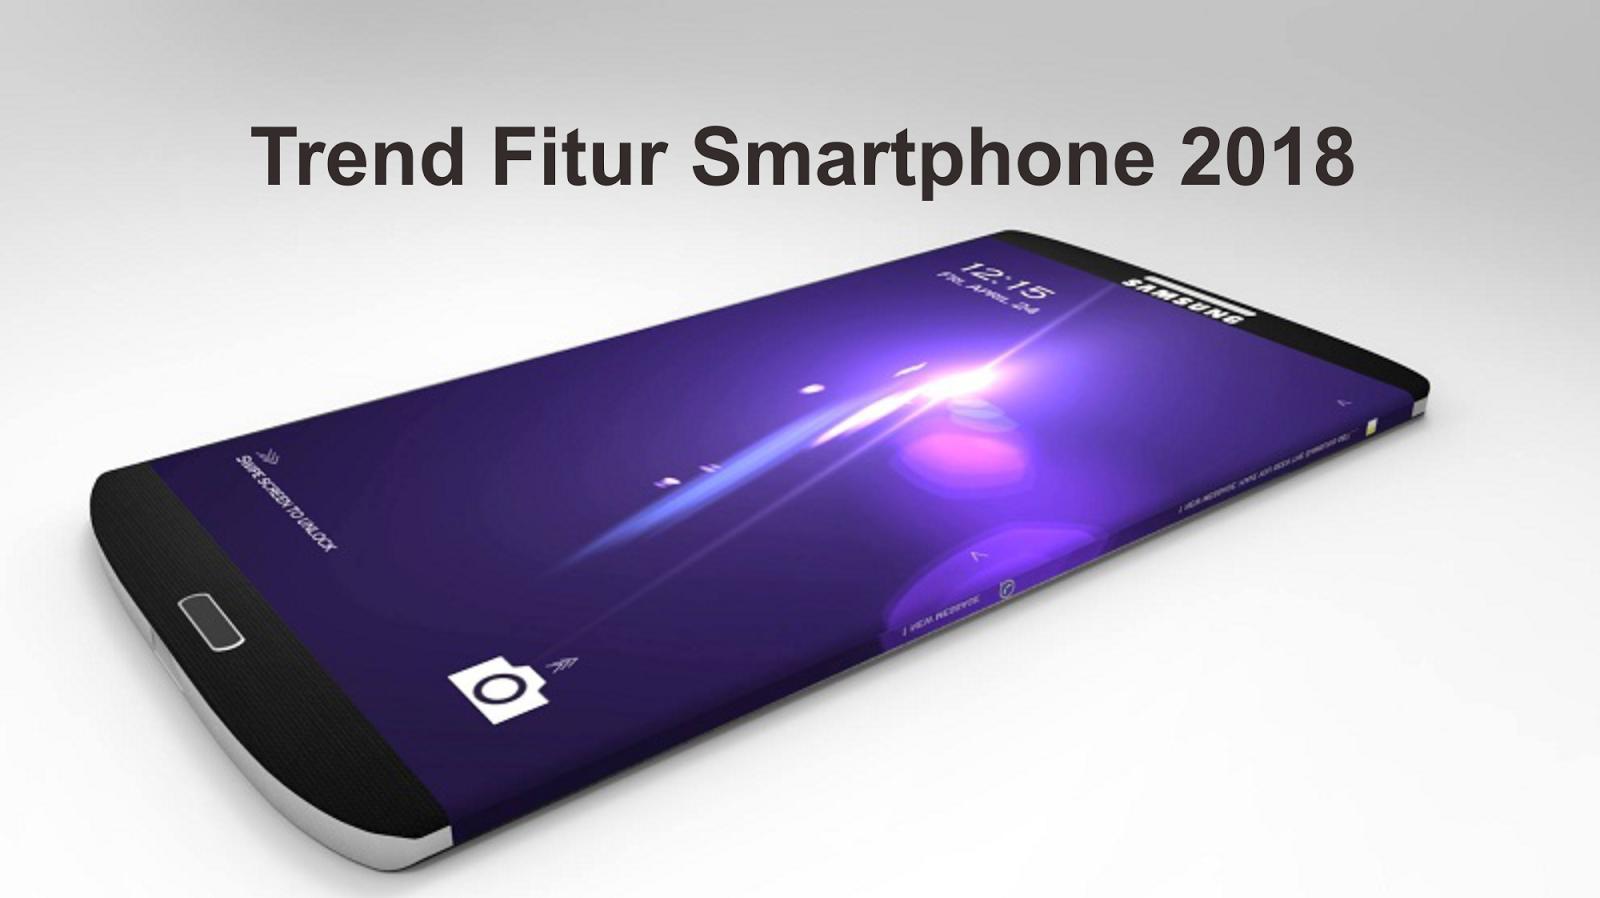 Trend Fitur Smartphone 2018